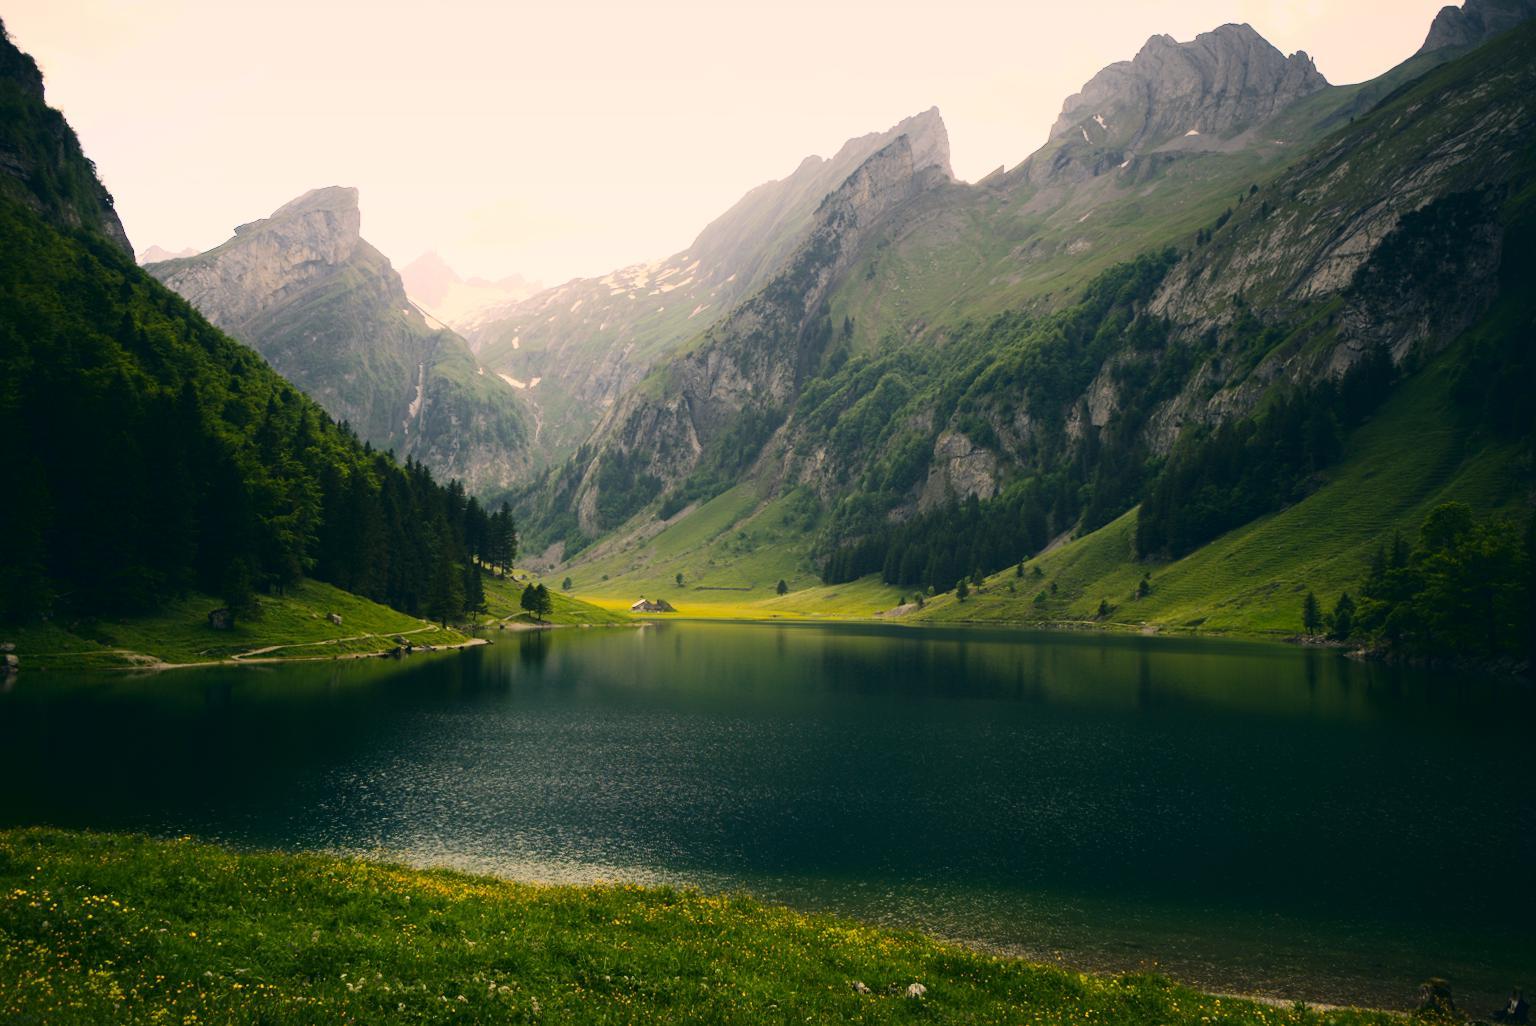 {filename}/img/appenzell-seealpsee-3.jpg